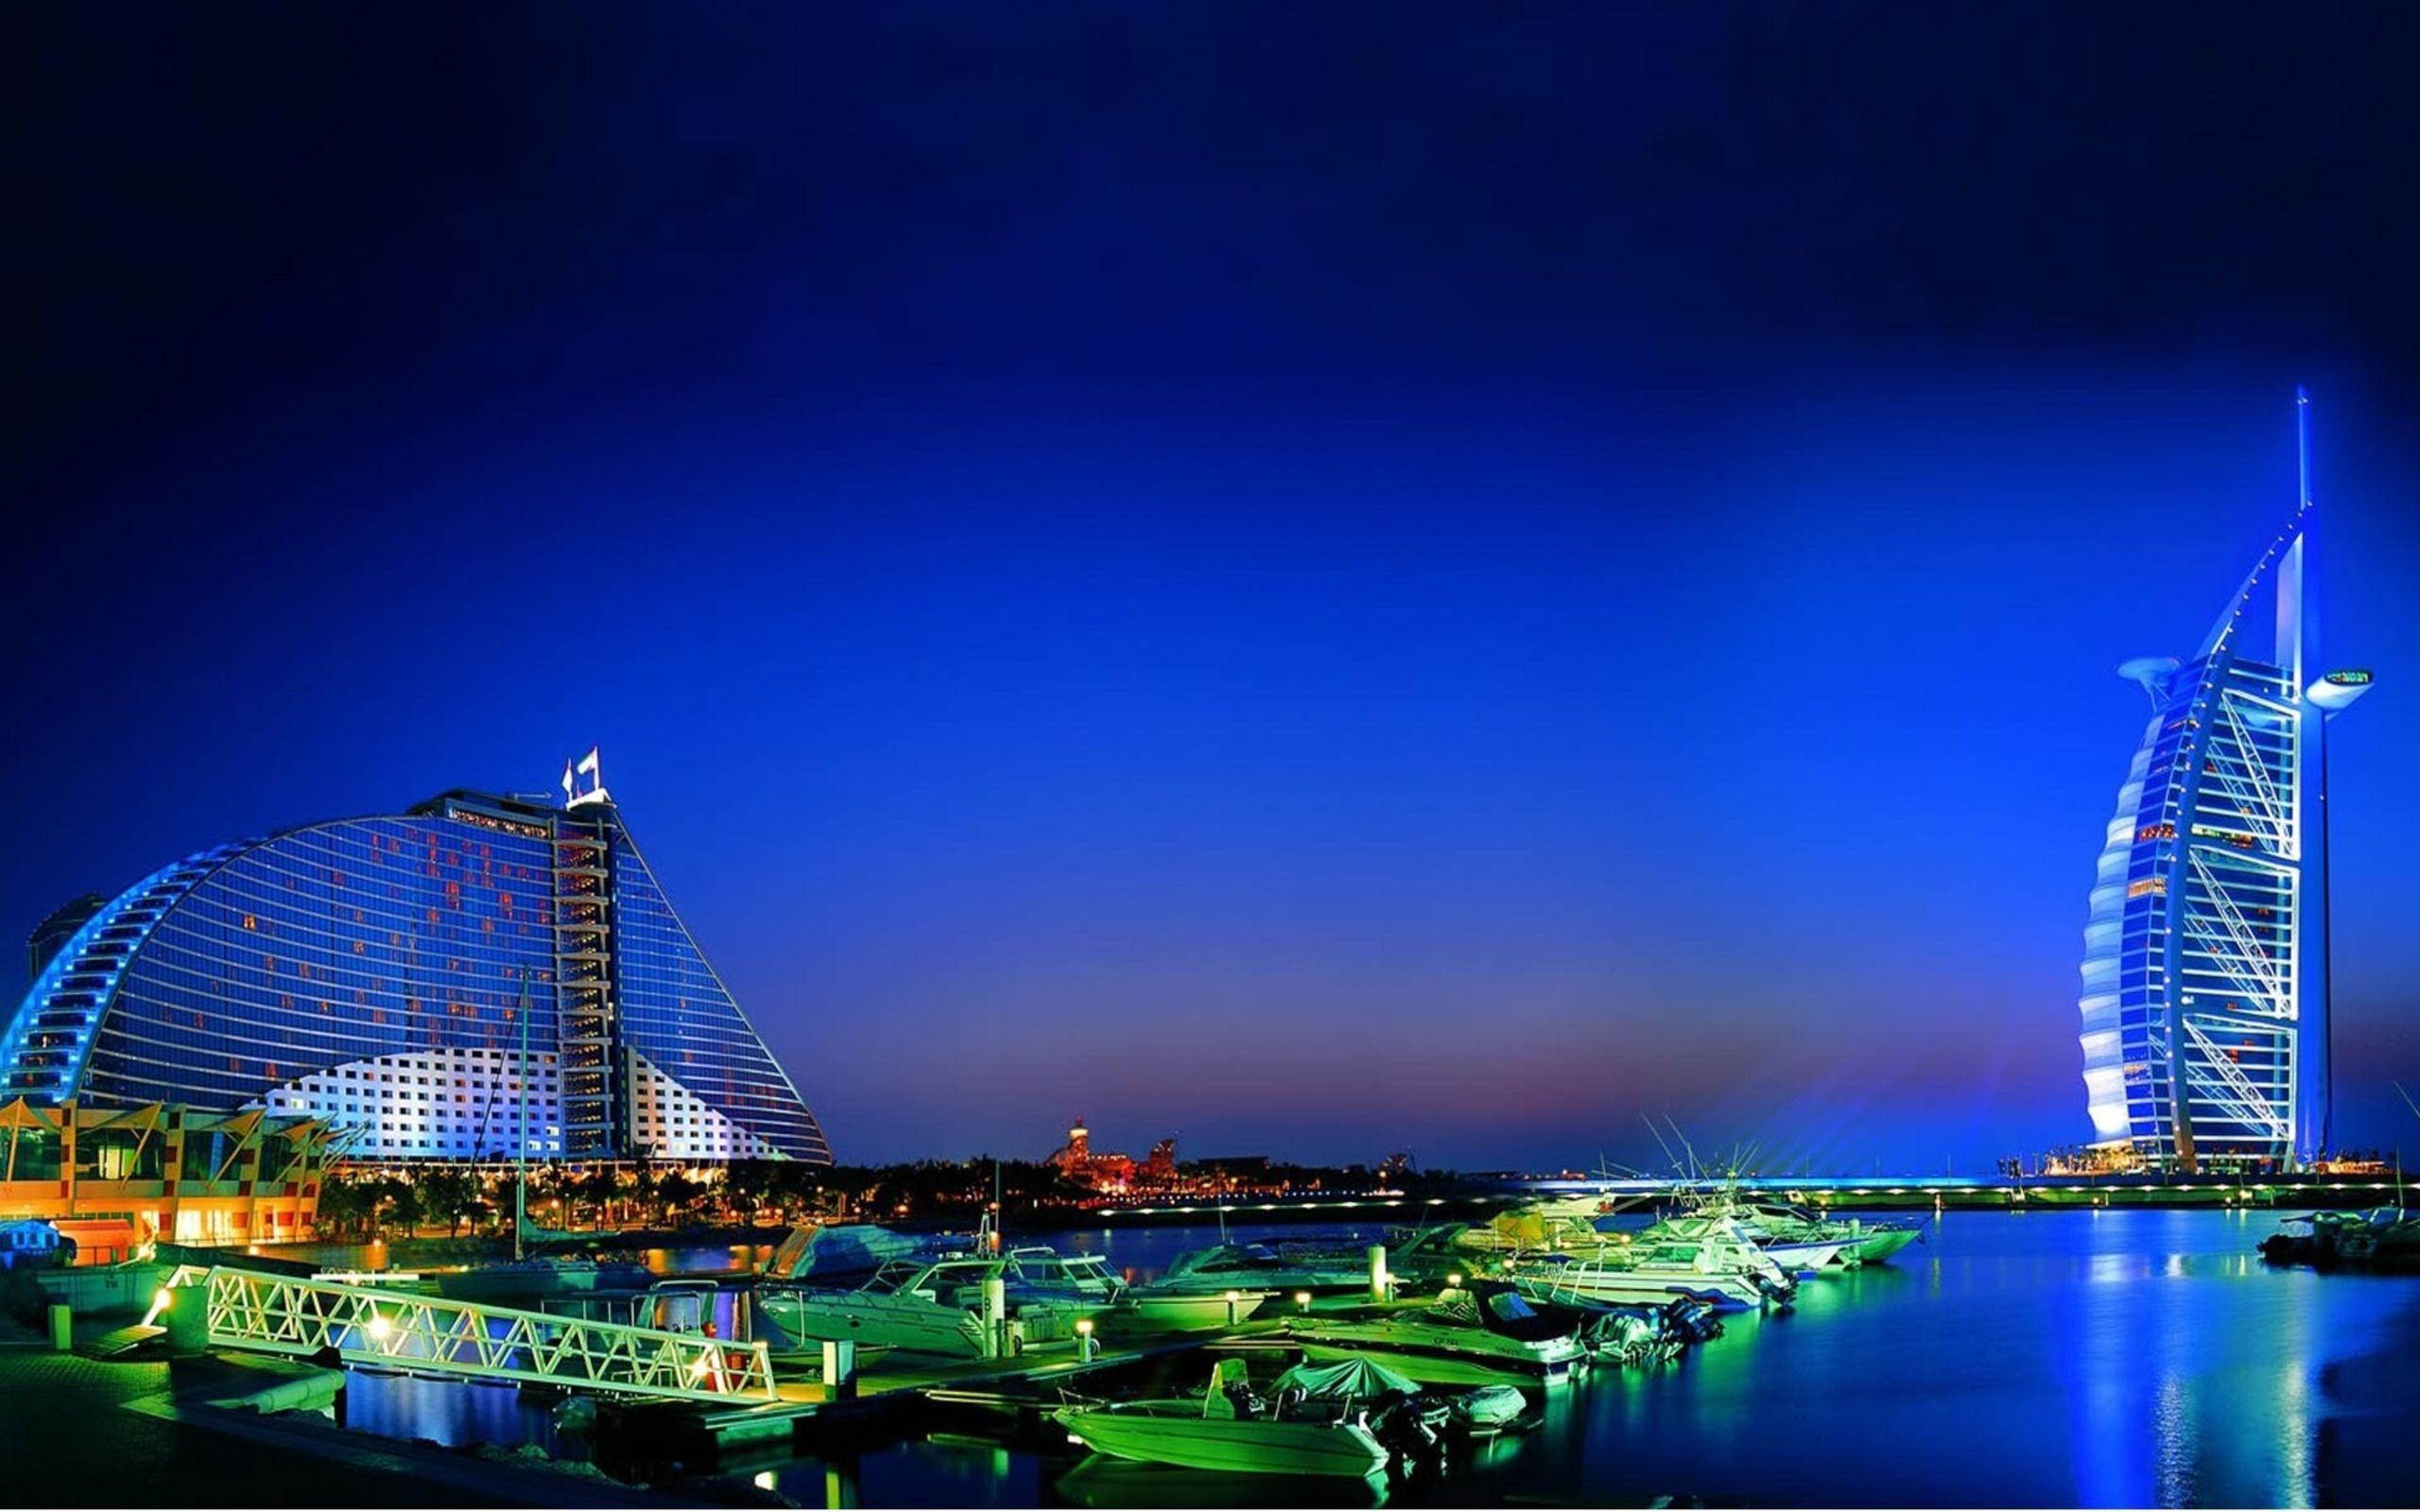 Amazing Wallpaper Night Beauty - beauty-city-Dubai-lights-evening-water-654286  Image.jpg